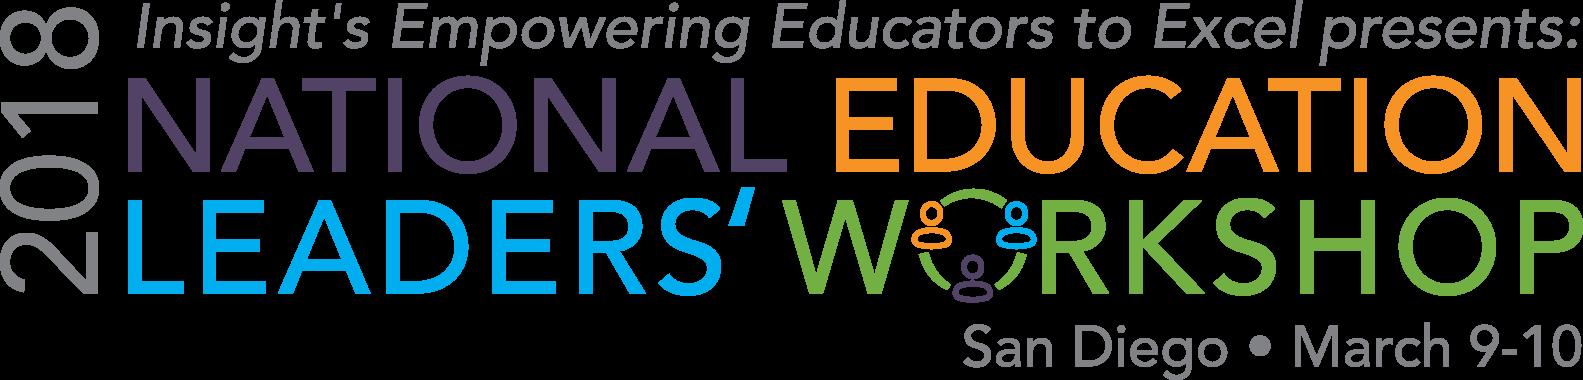 National Education Leaders' Workshop - San Diego - March 2018